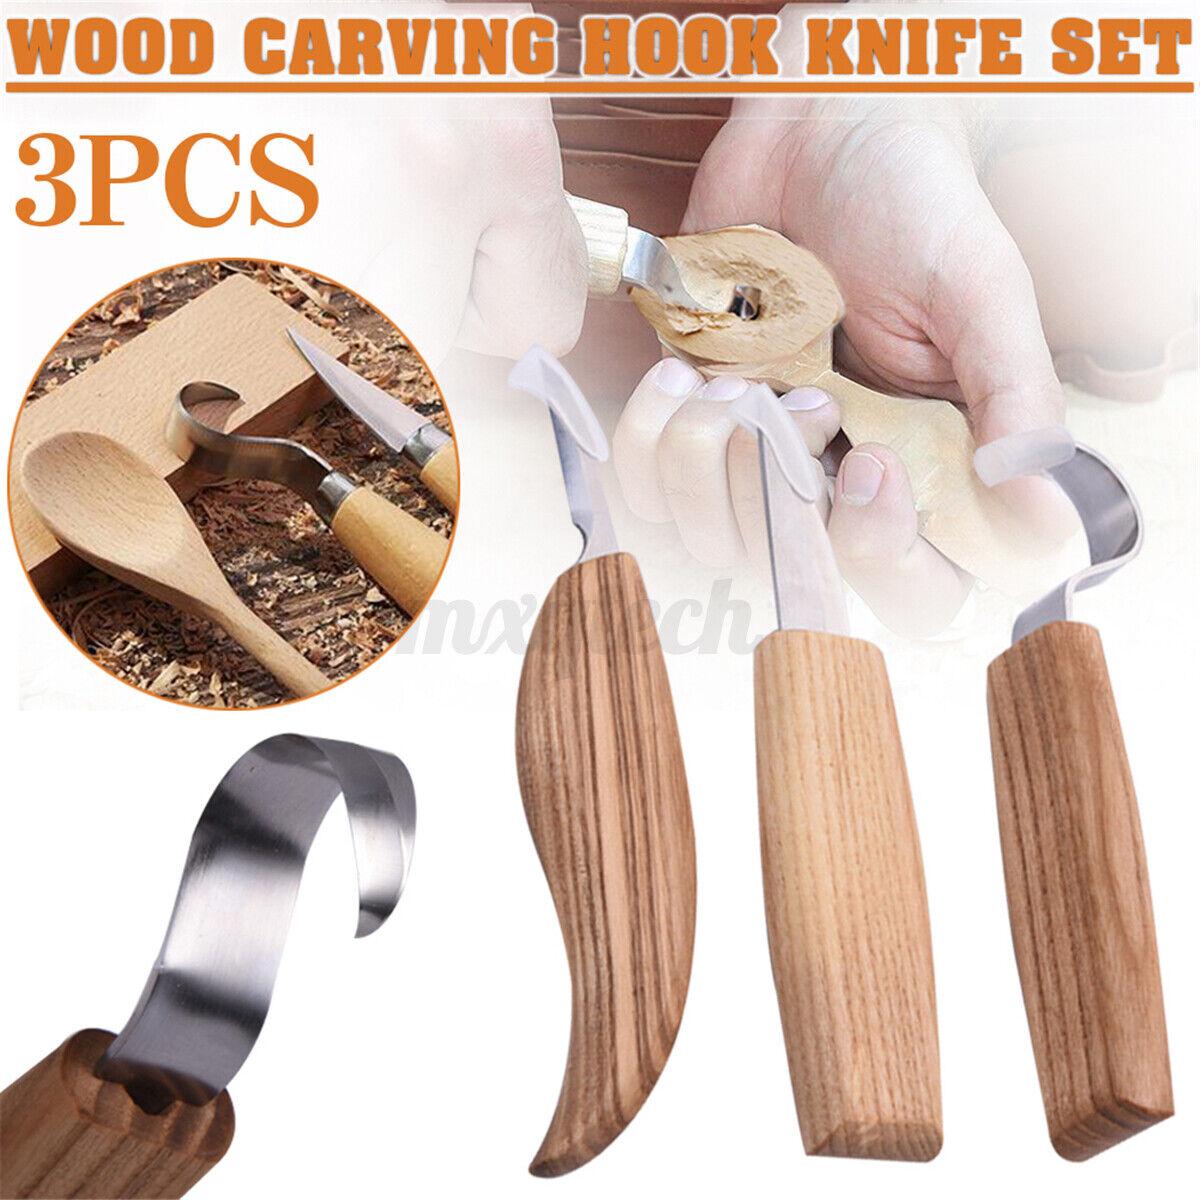 3Pcs Wood Carving Hook Crook Spoon Bowl Bushcraft Whittling Hand Tools Se